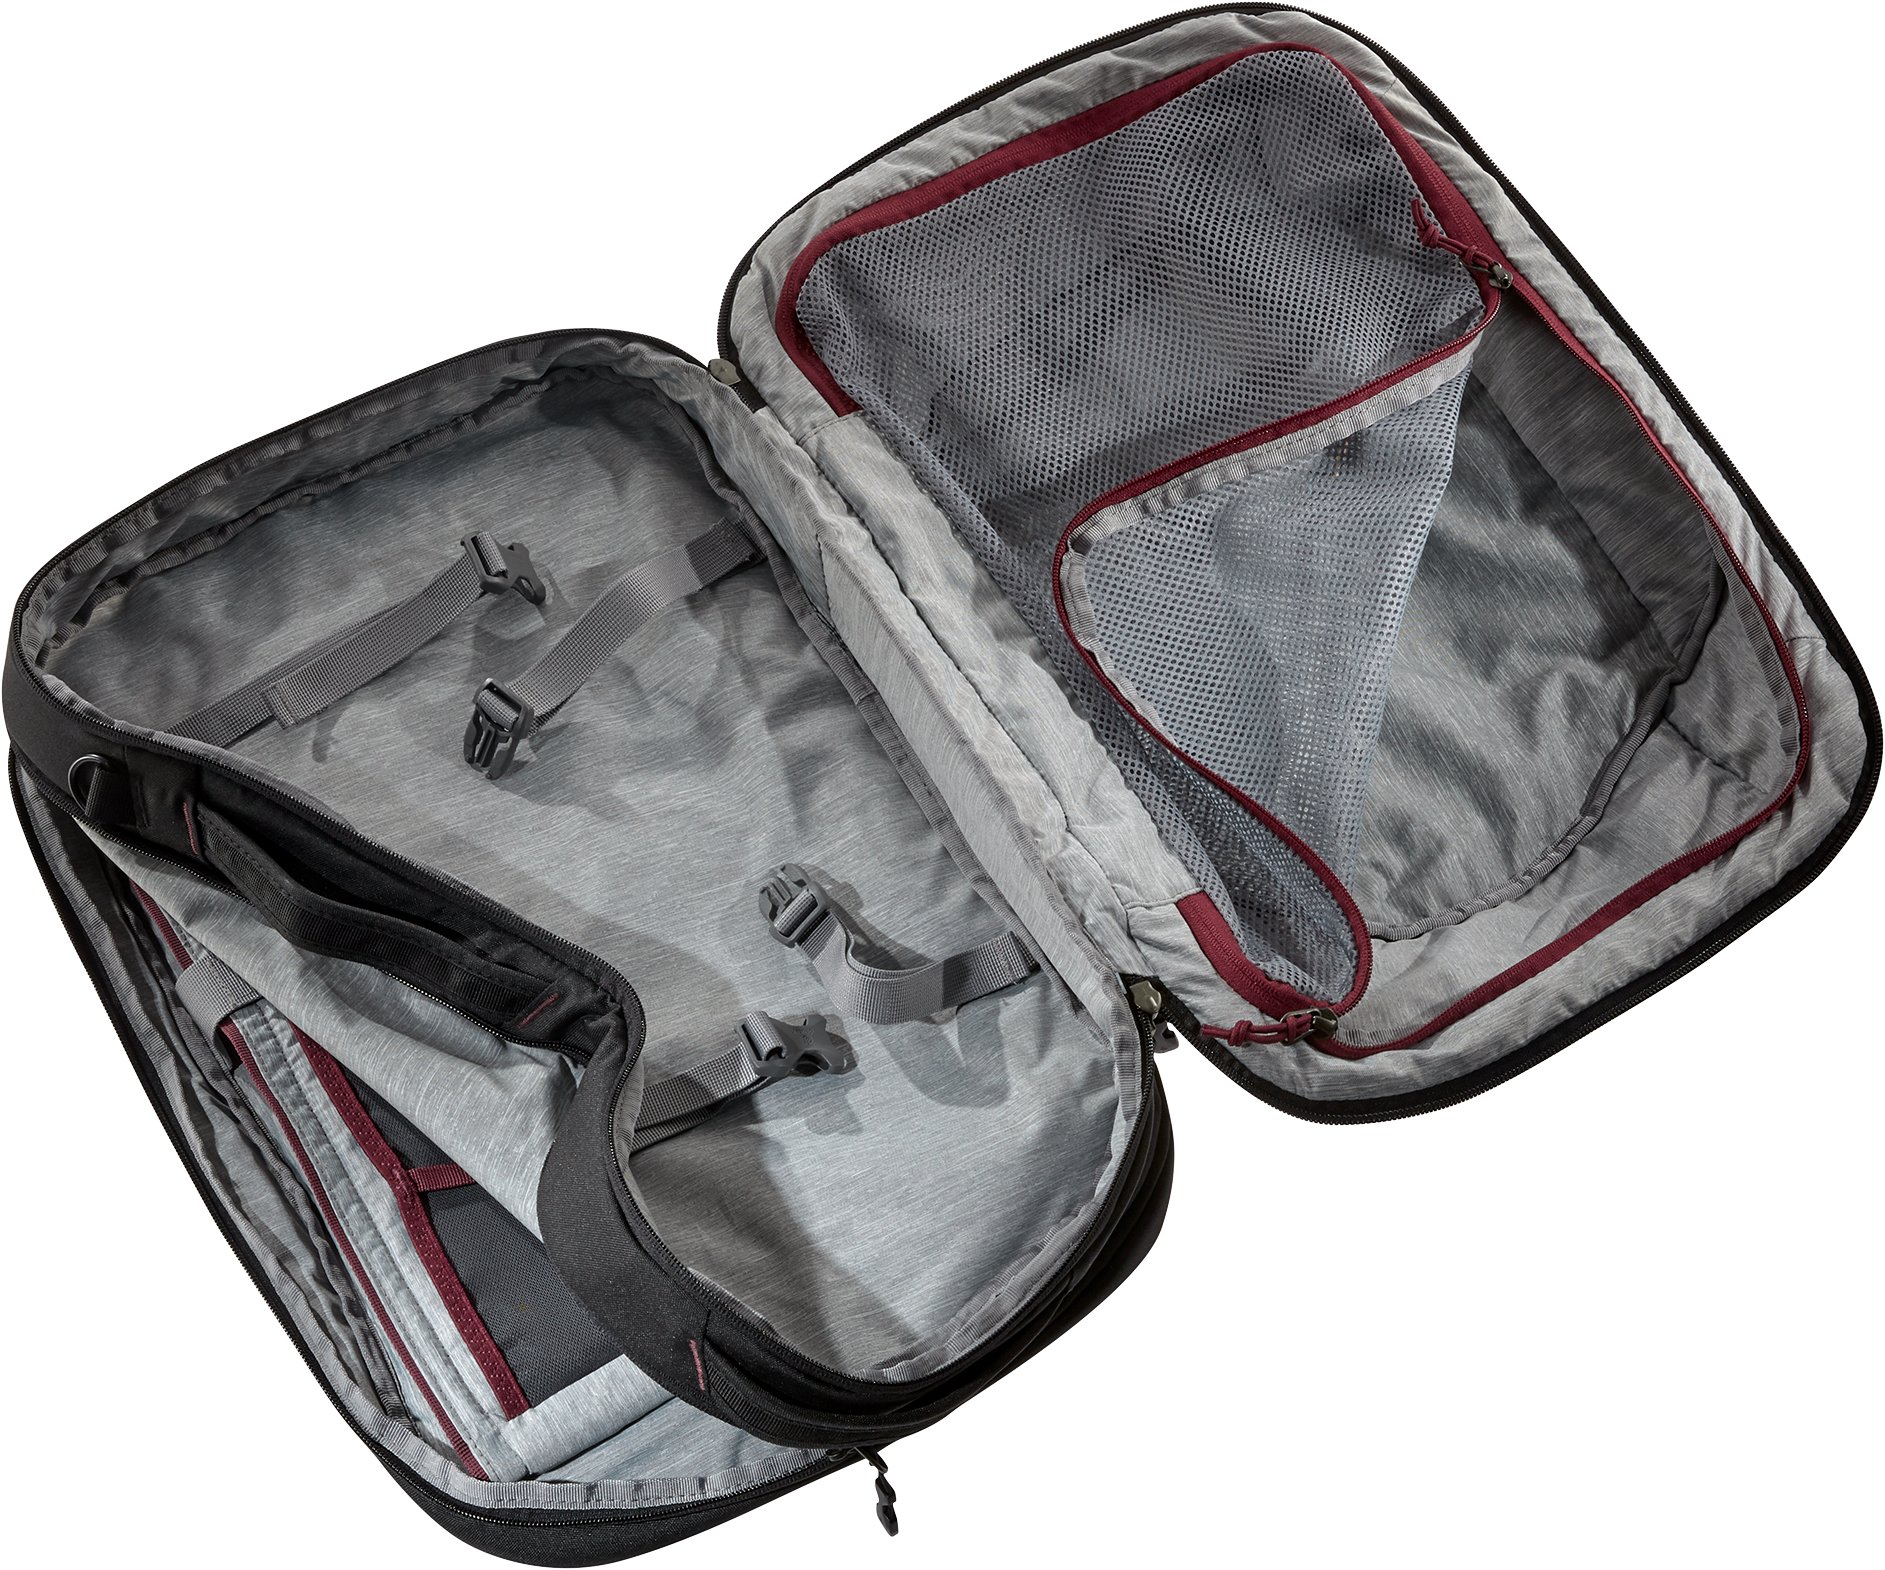 Deuter - AViANT Carry On 28 SL, Reisetasche